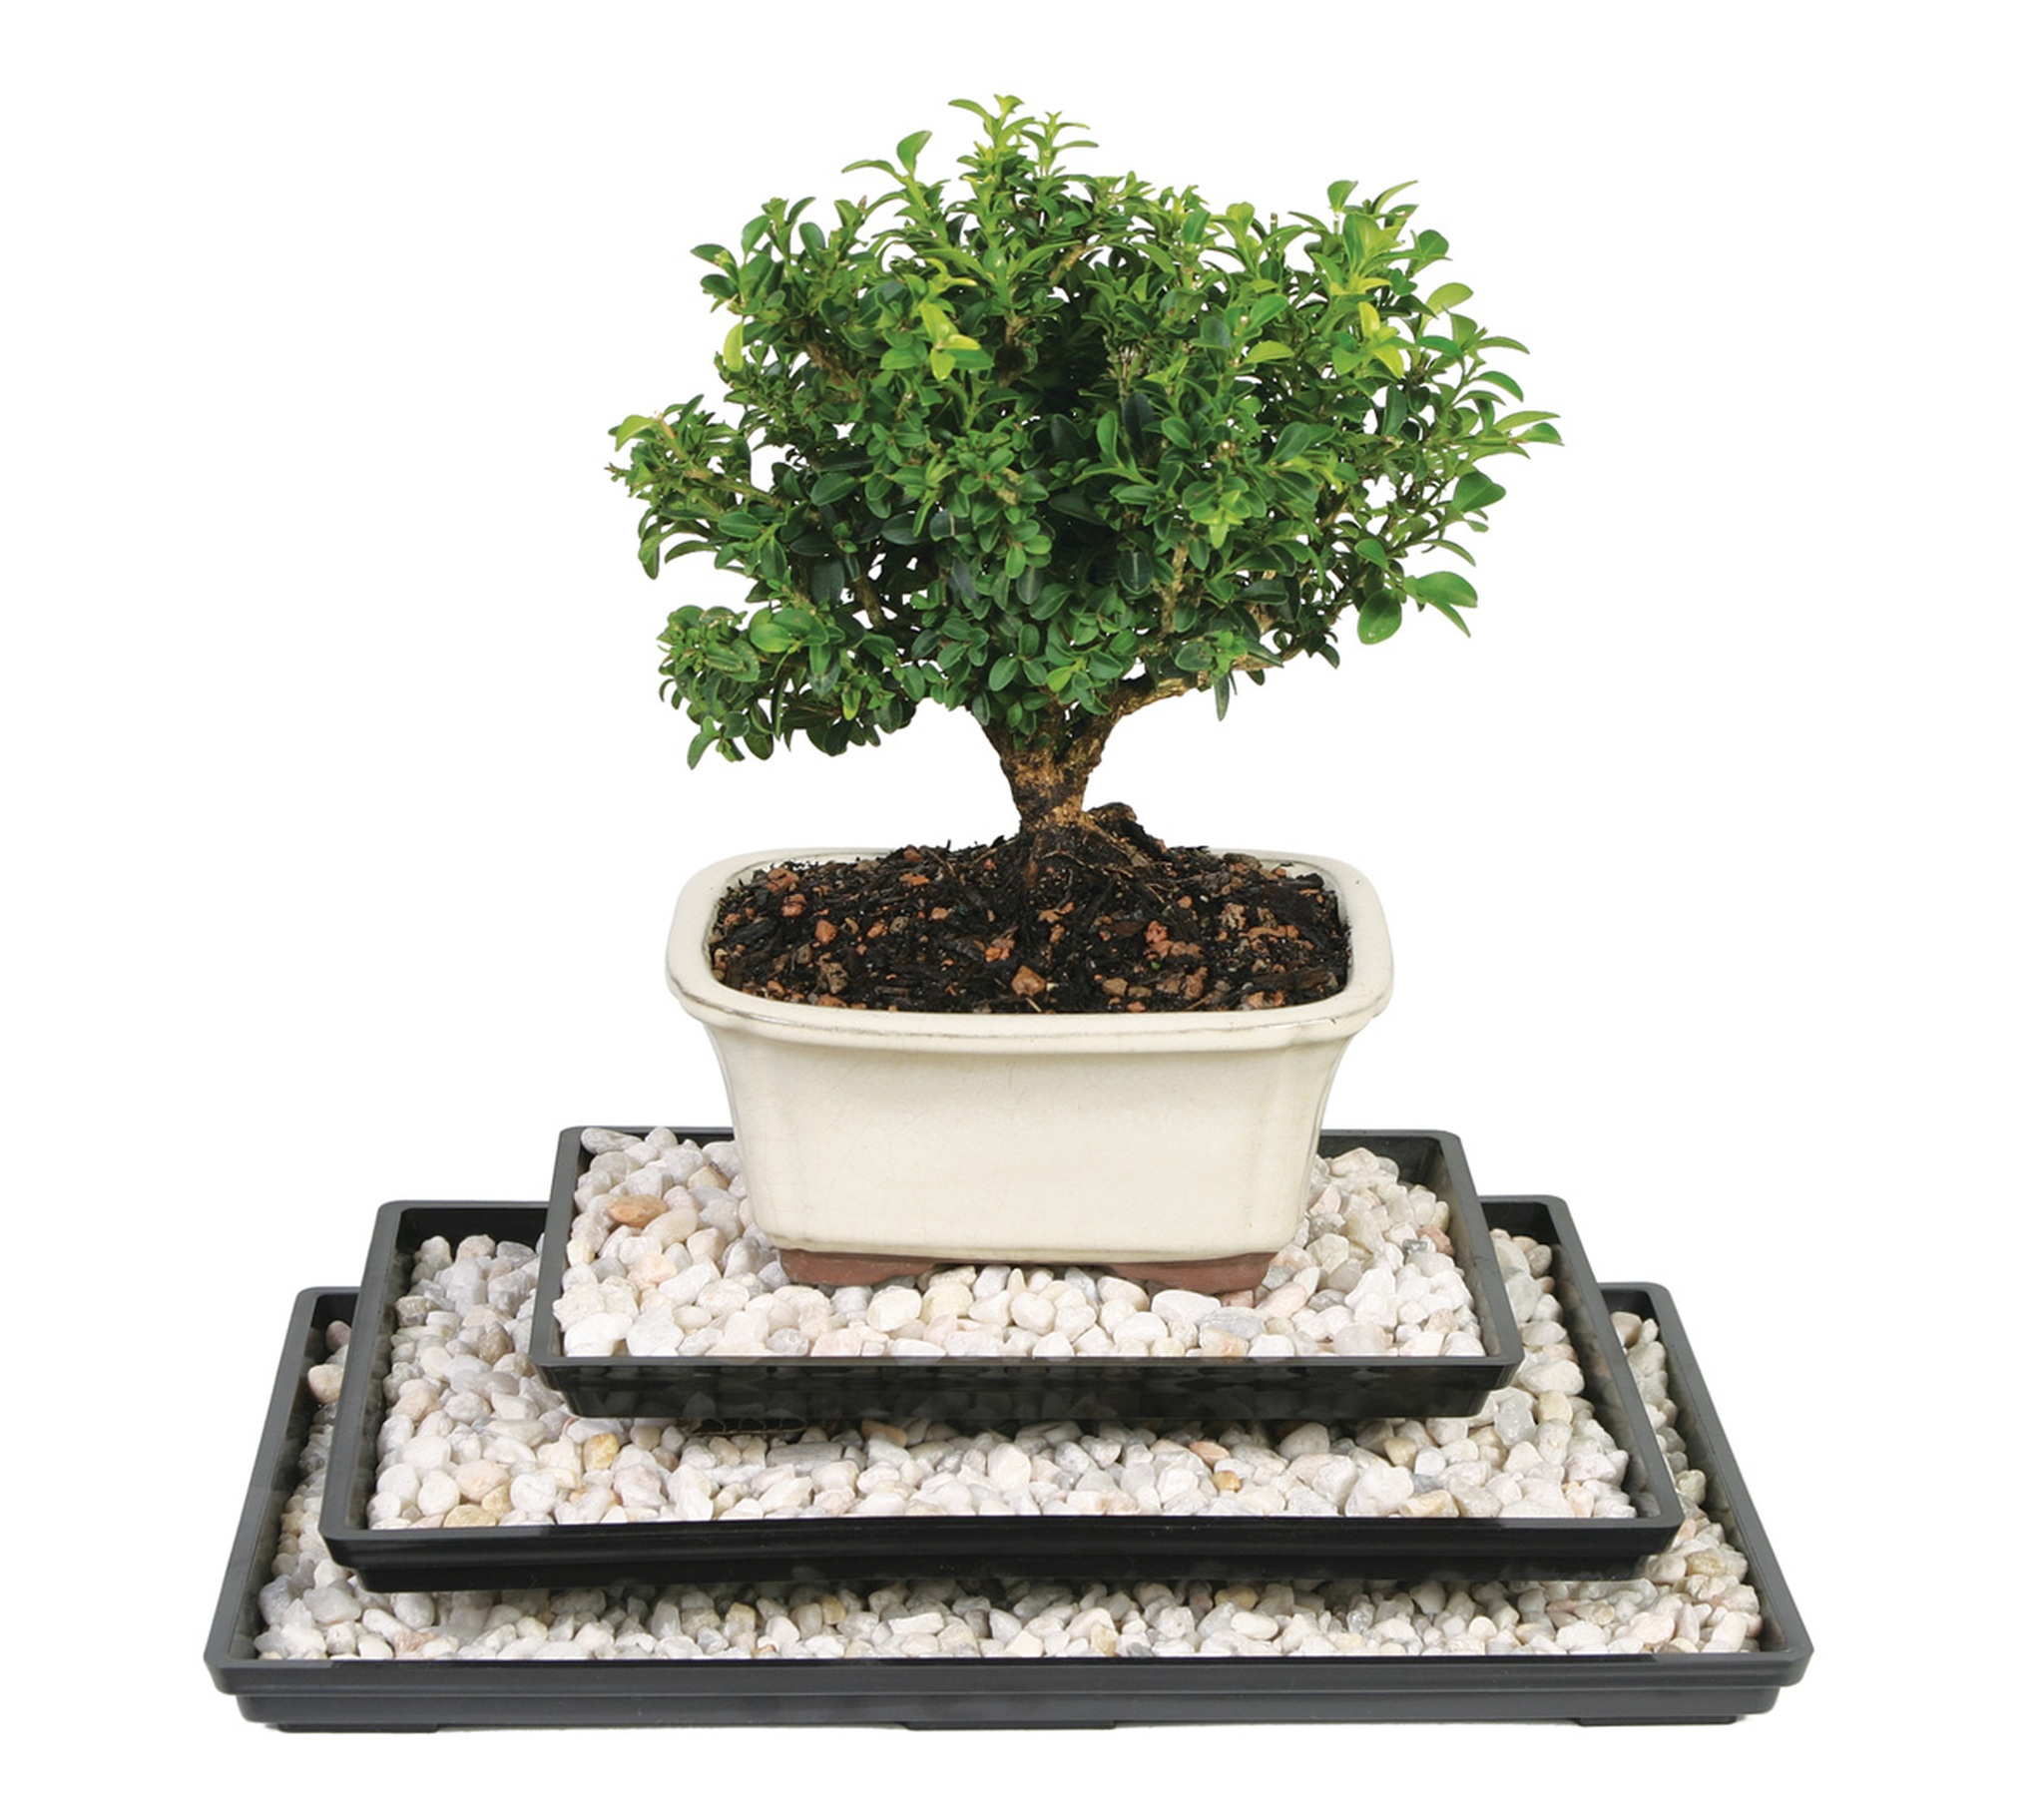 13 Bonsai Drip Tray Bonsai Tree Humidity Tray Brussel S Brussel S Bonsai